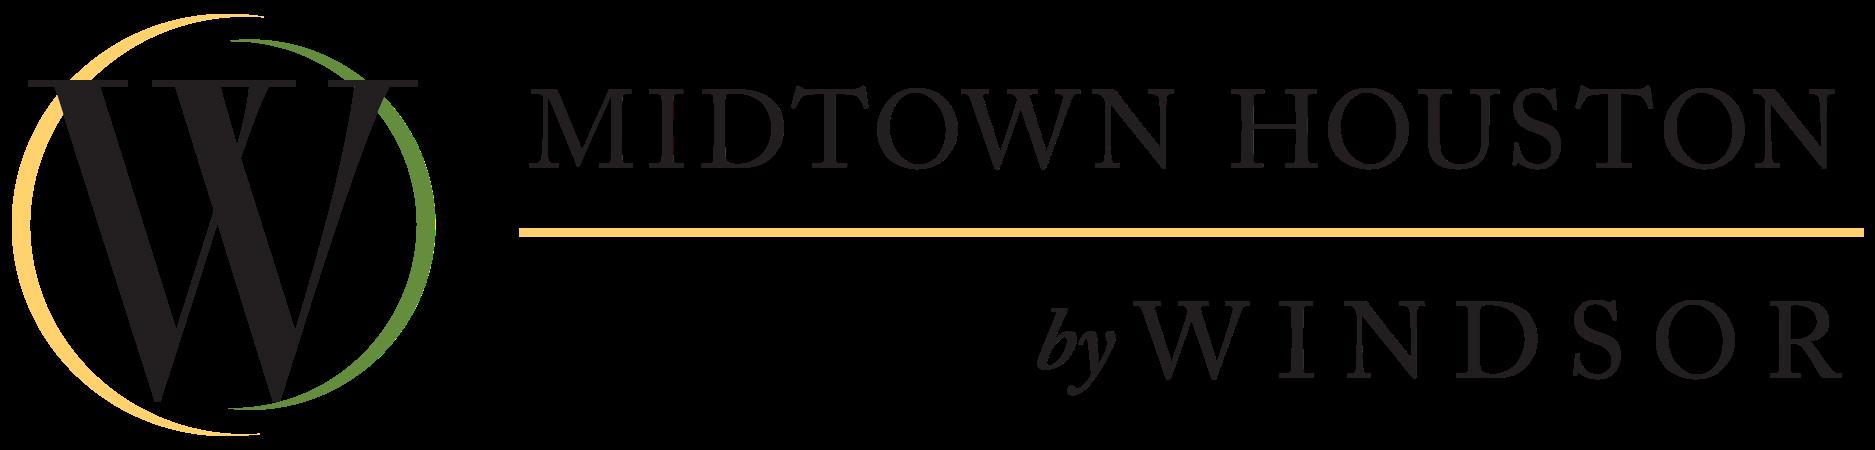 Midtown Houston by Windsor